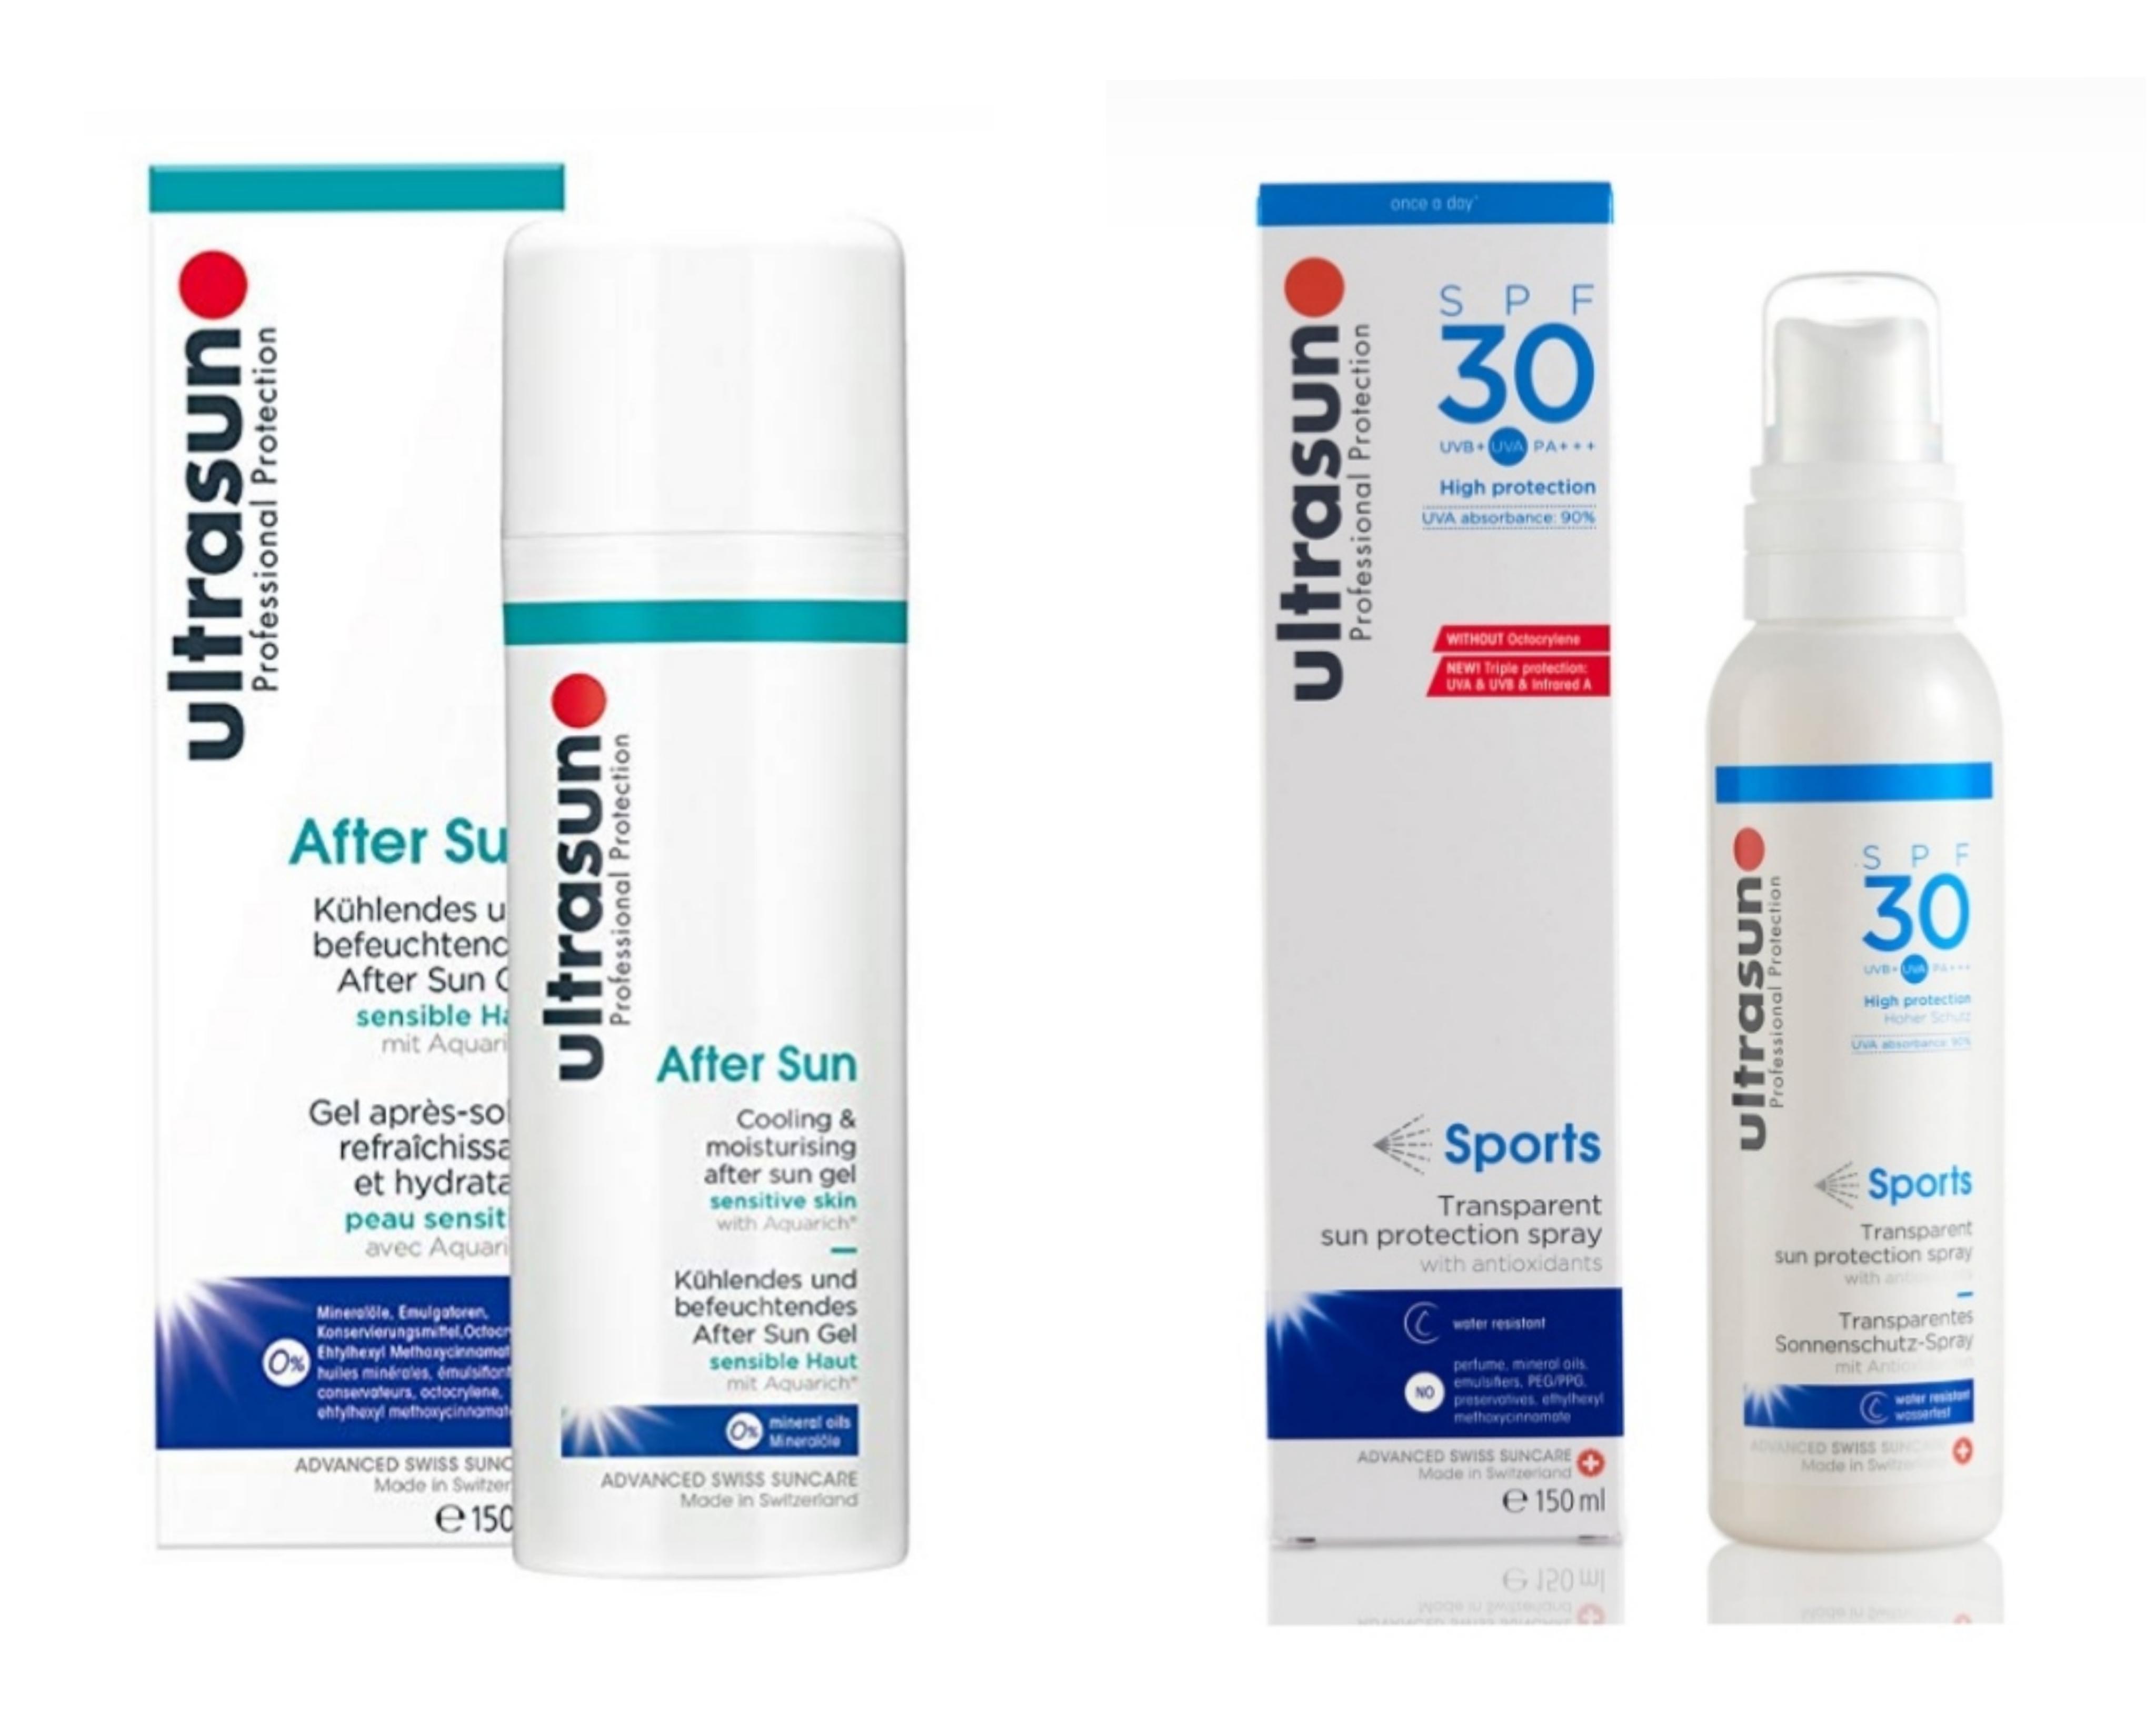 Ultrasun Paket  Sports Spray SPF 30 und After Sun, 150ml